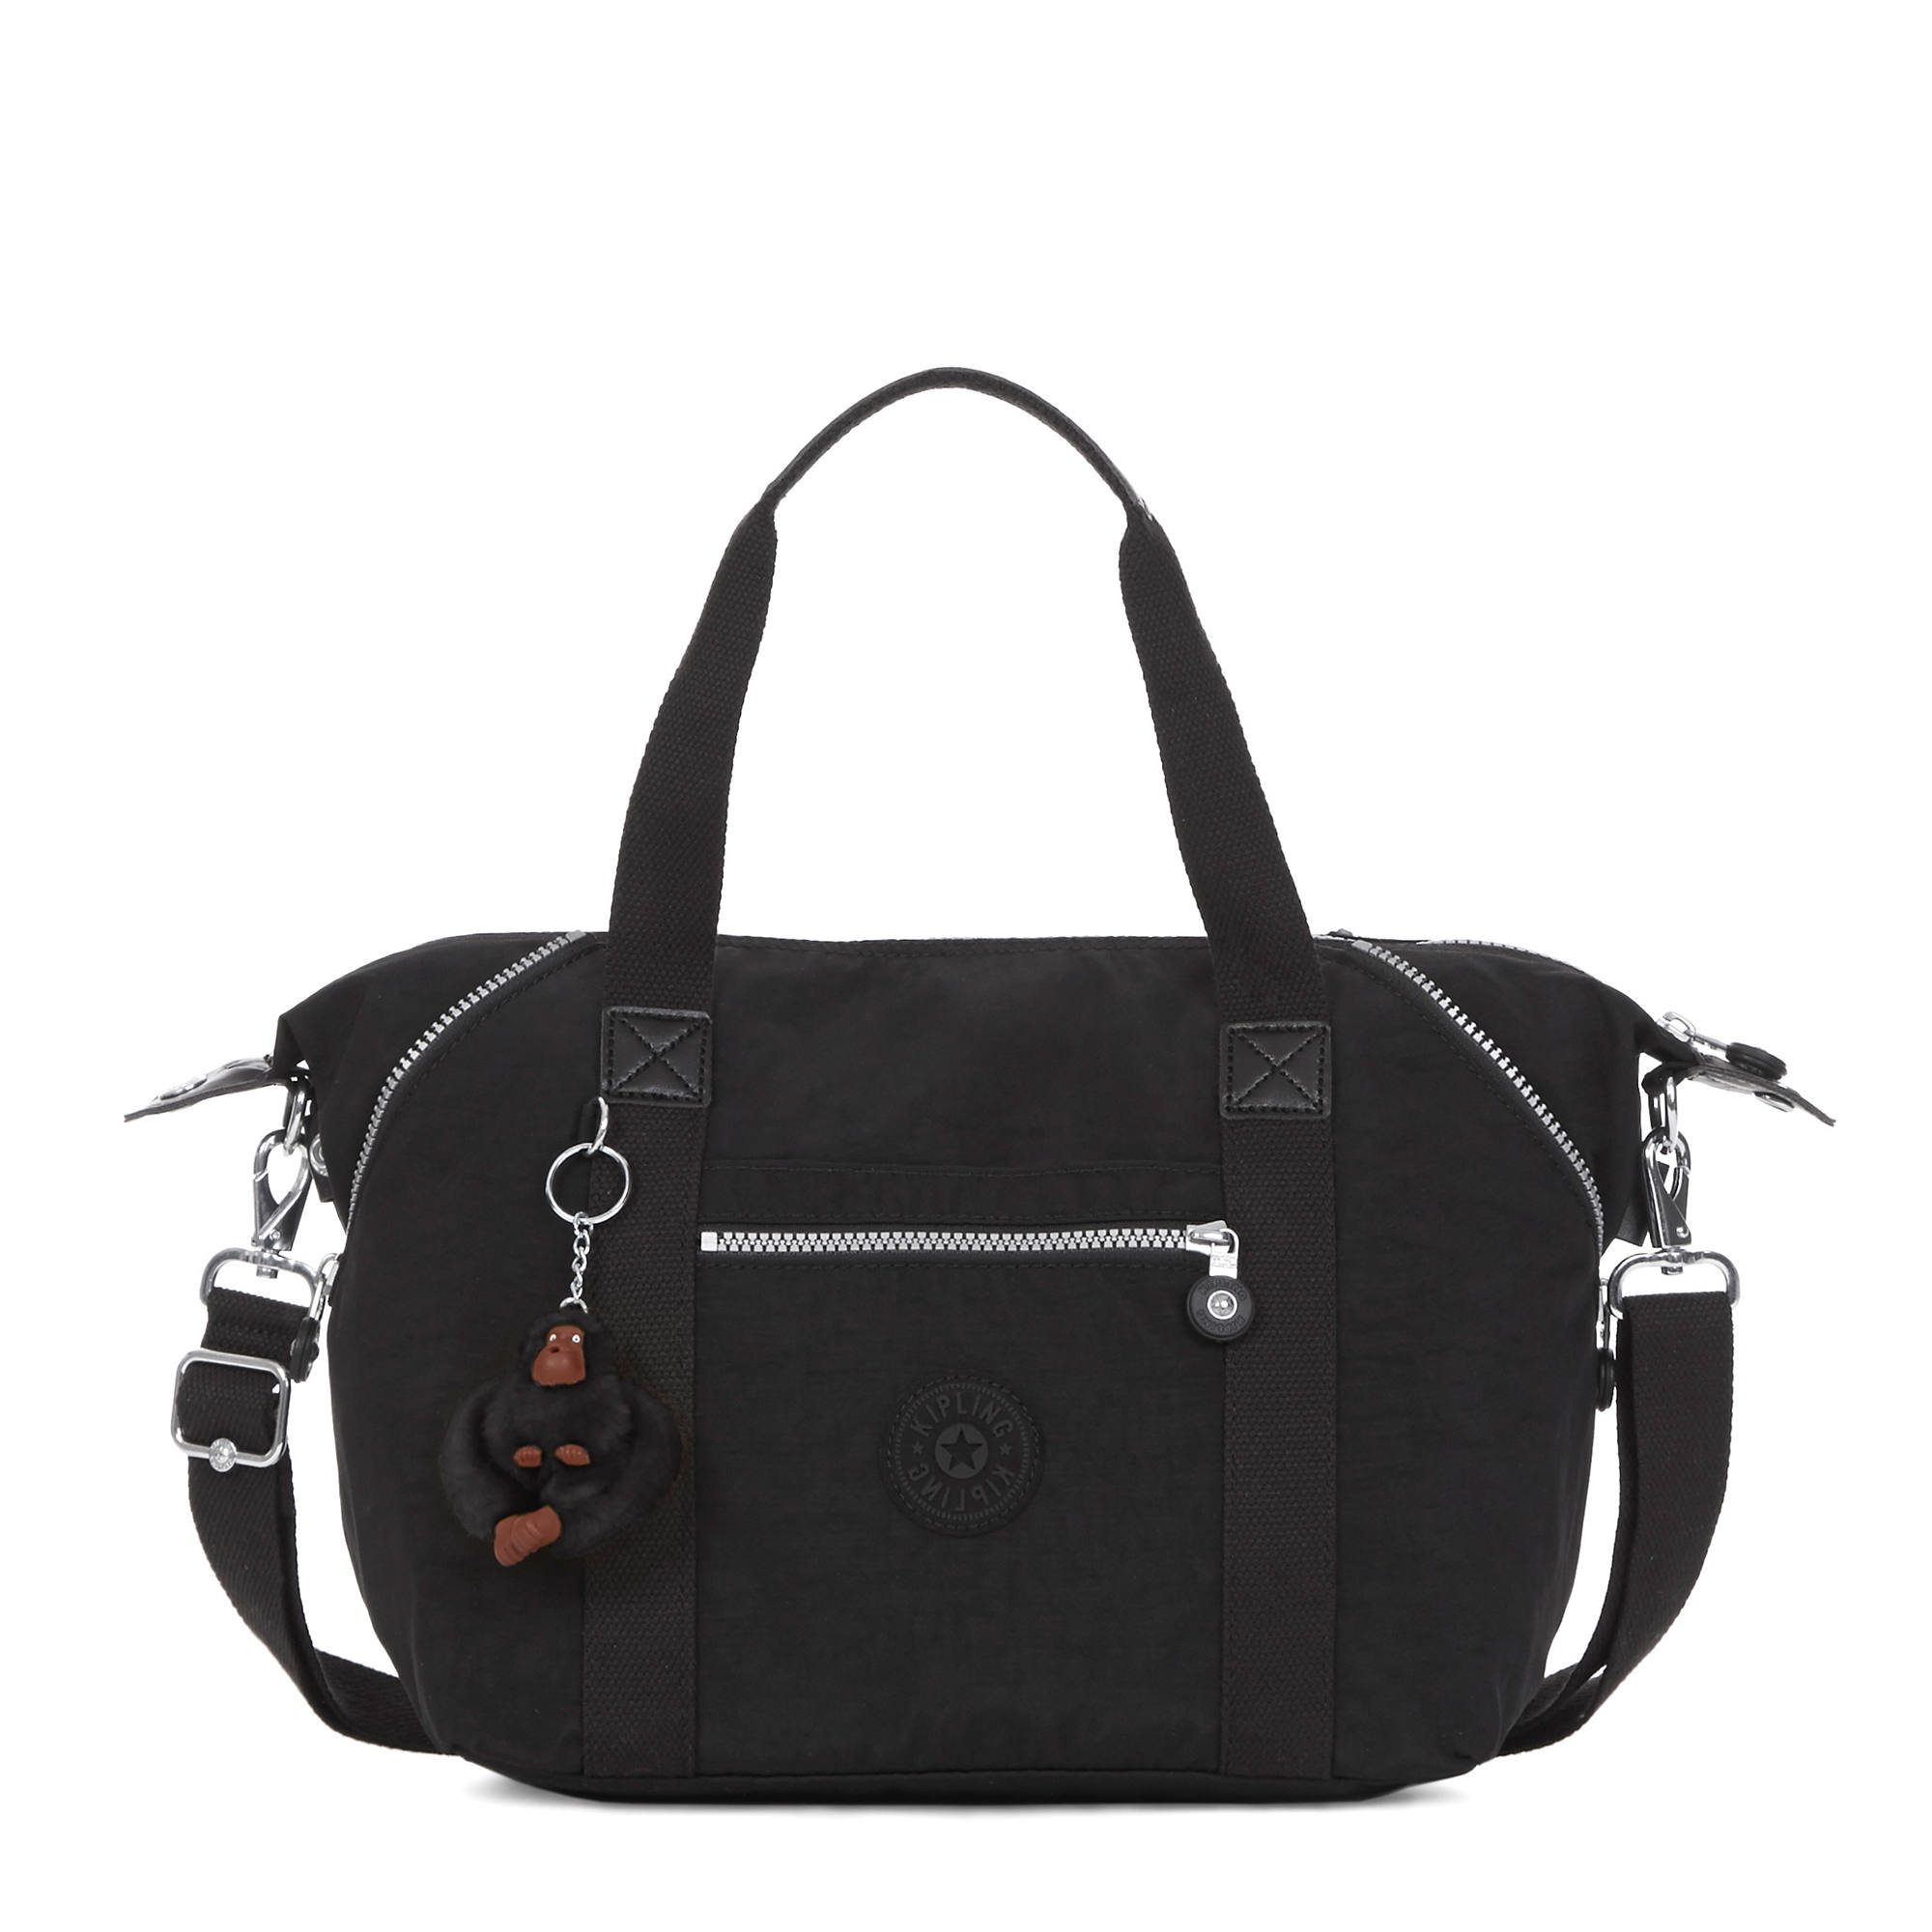 Art Small Handbag Black Large